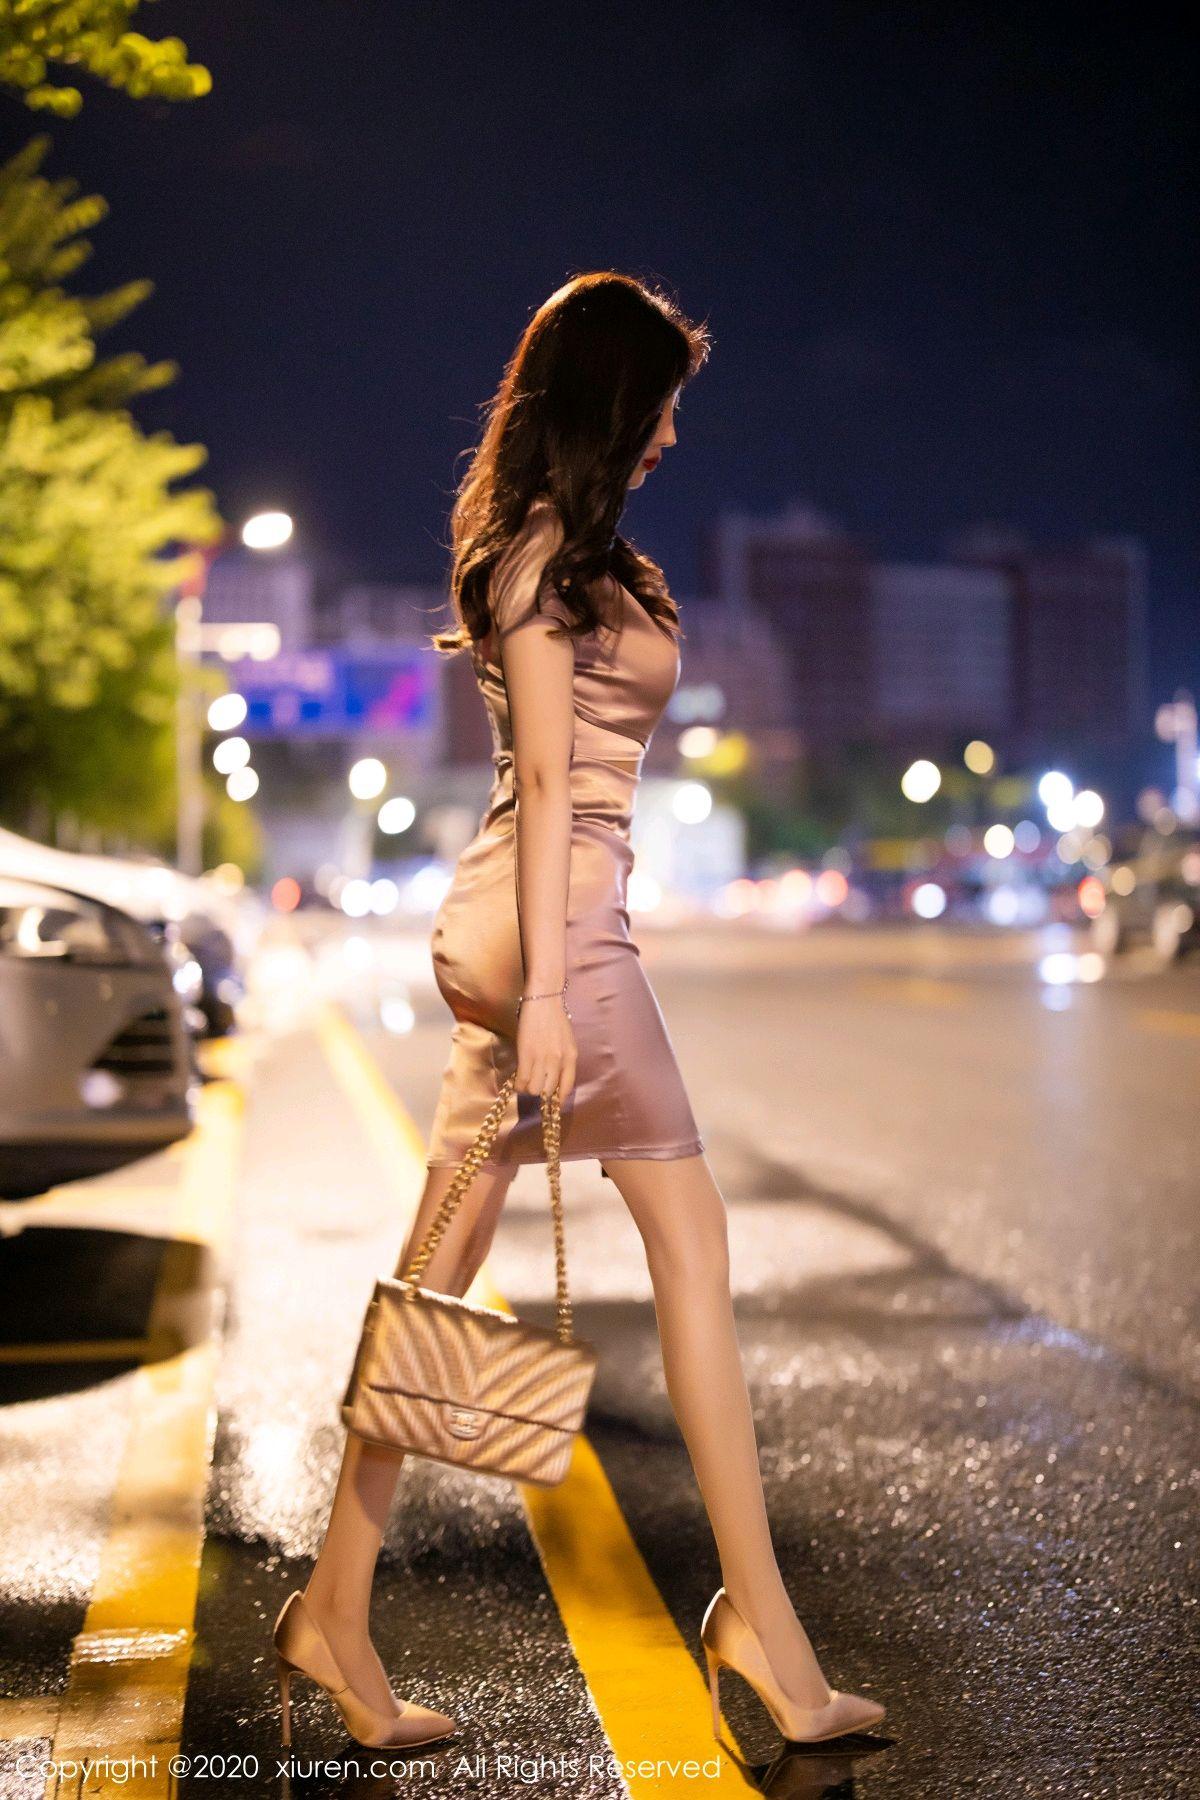 [XiuRen] Vol.2587 Yang Chen Chen 14P, Underwear, Xiuren, Yang Chen Chen